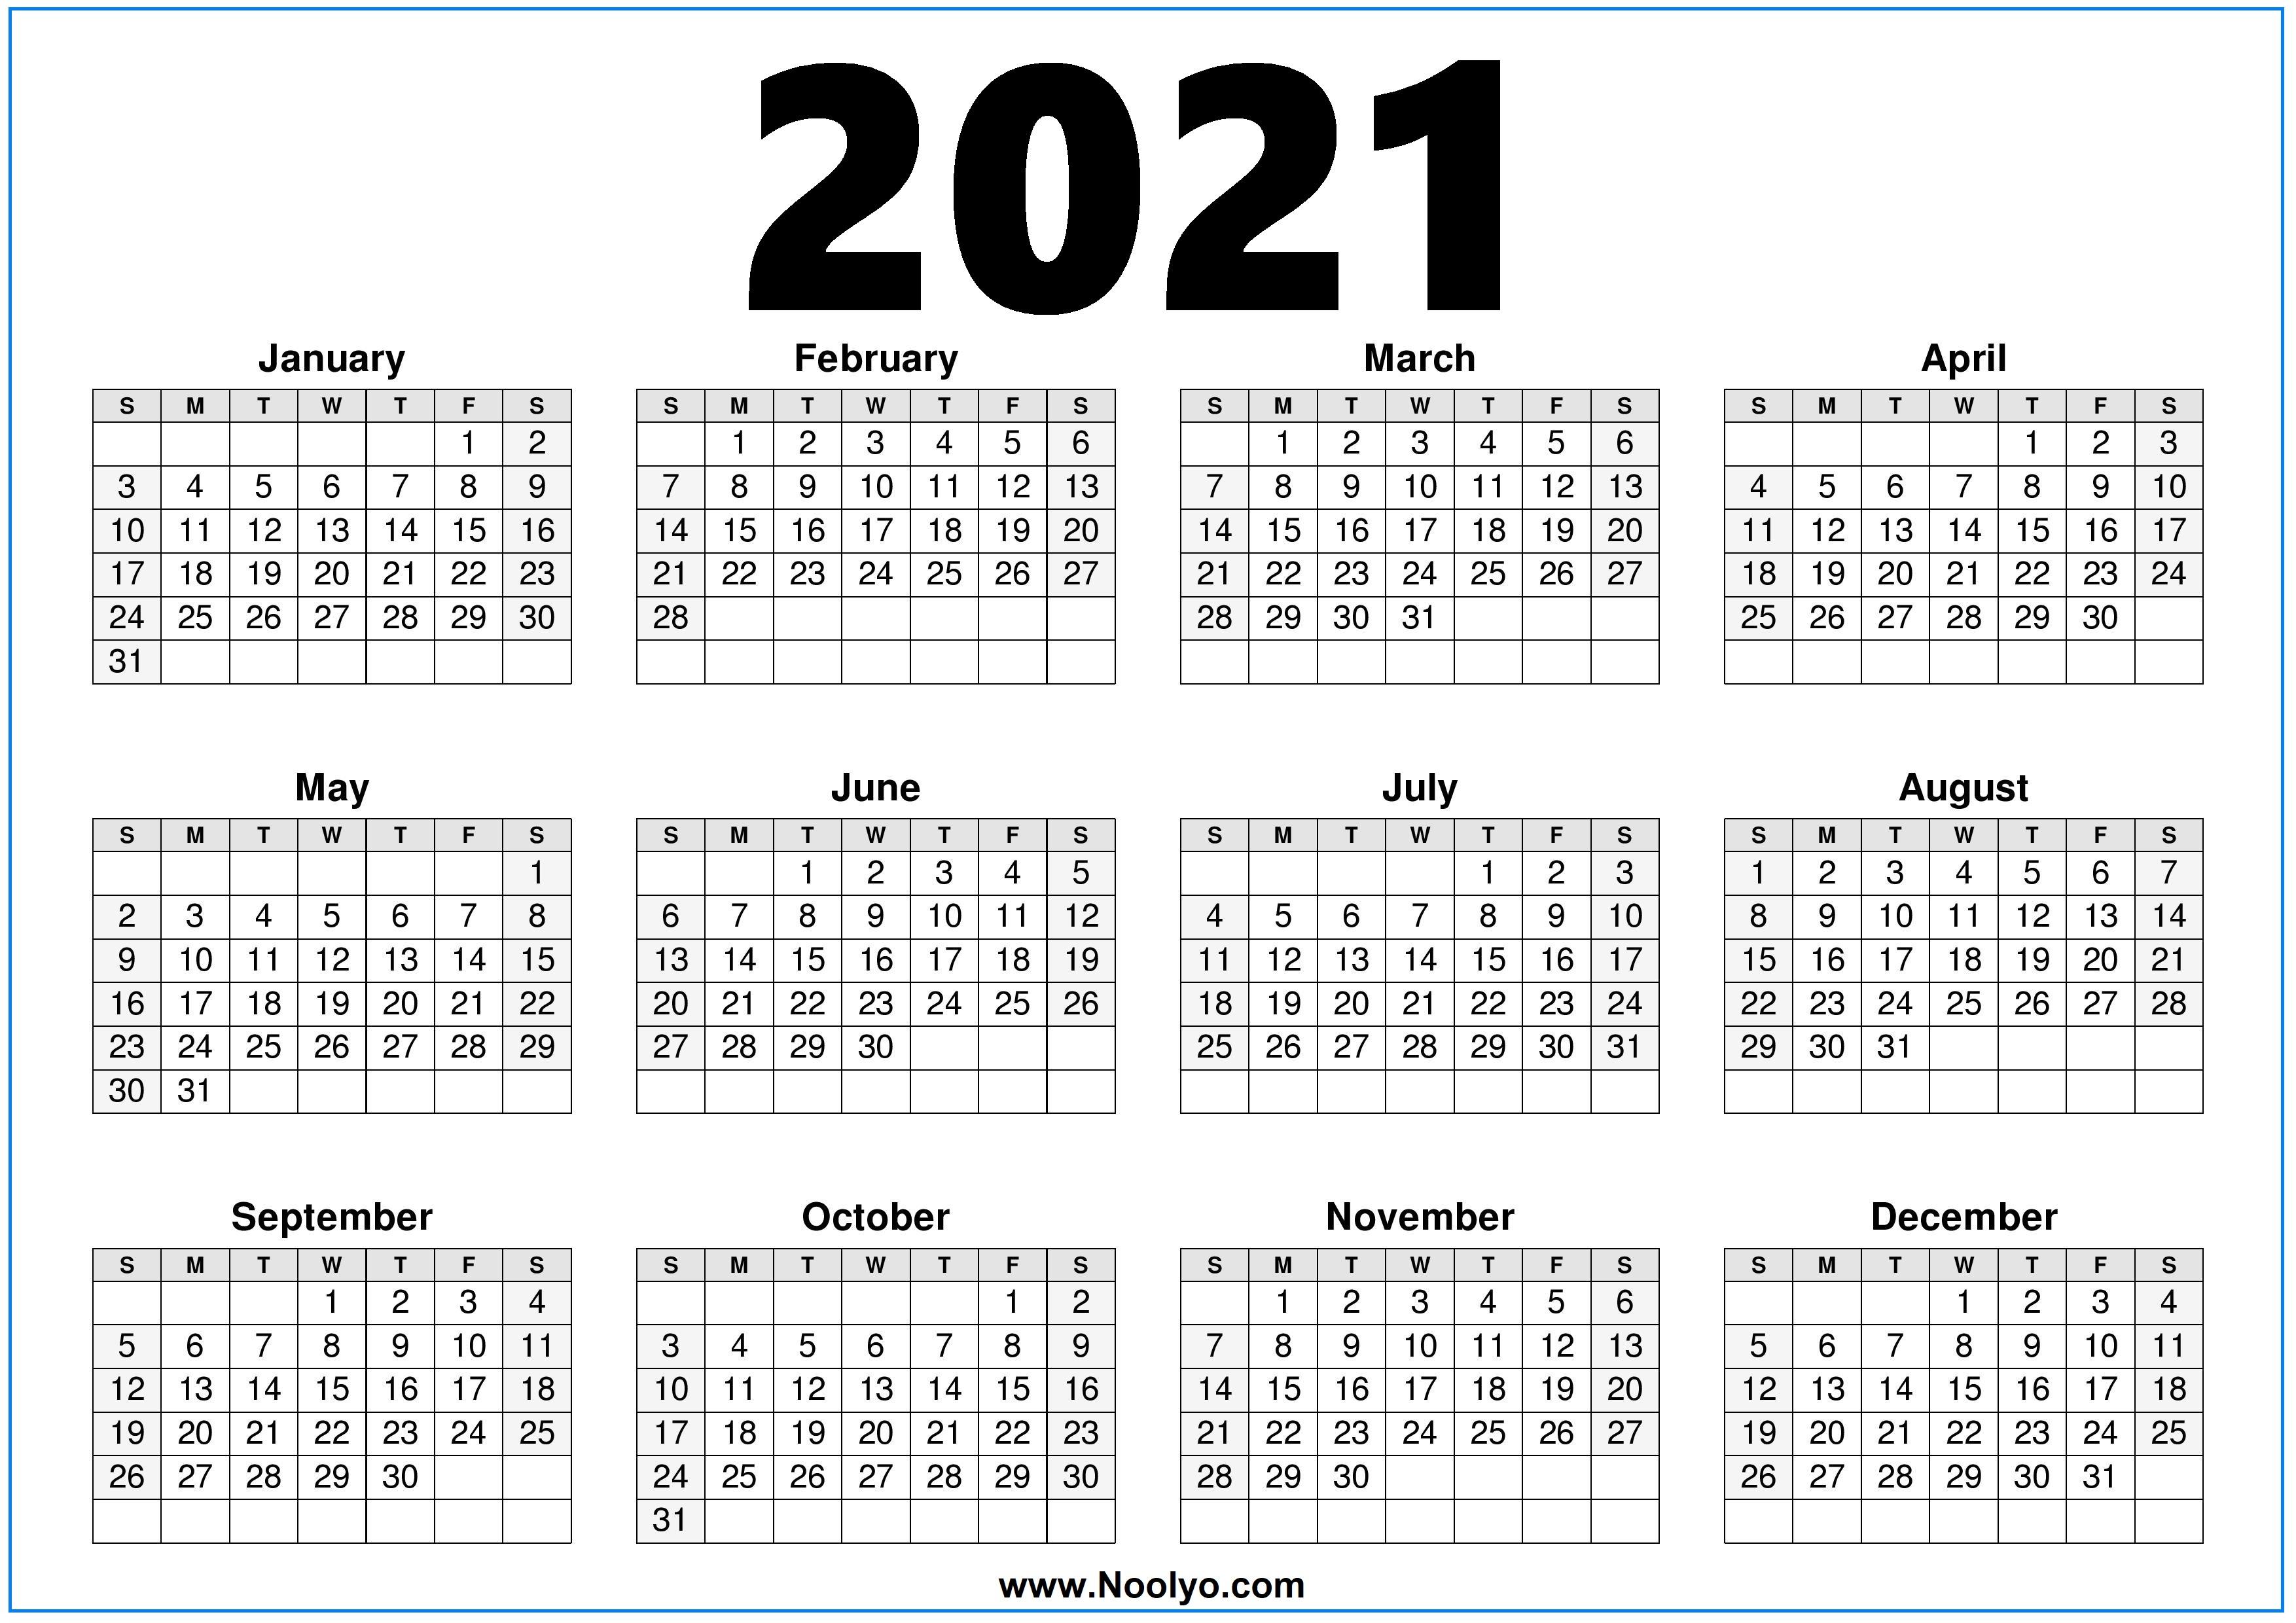 2021 Calendar Printable Free One page - Noolyo.com